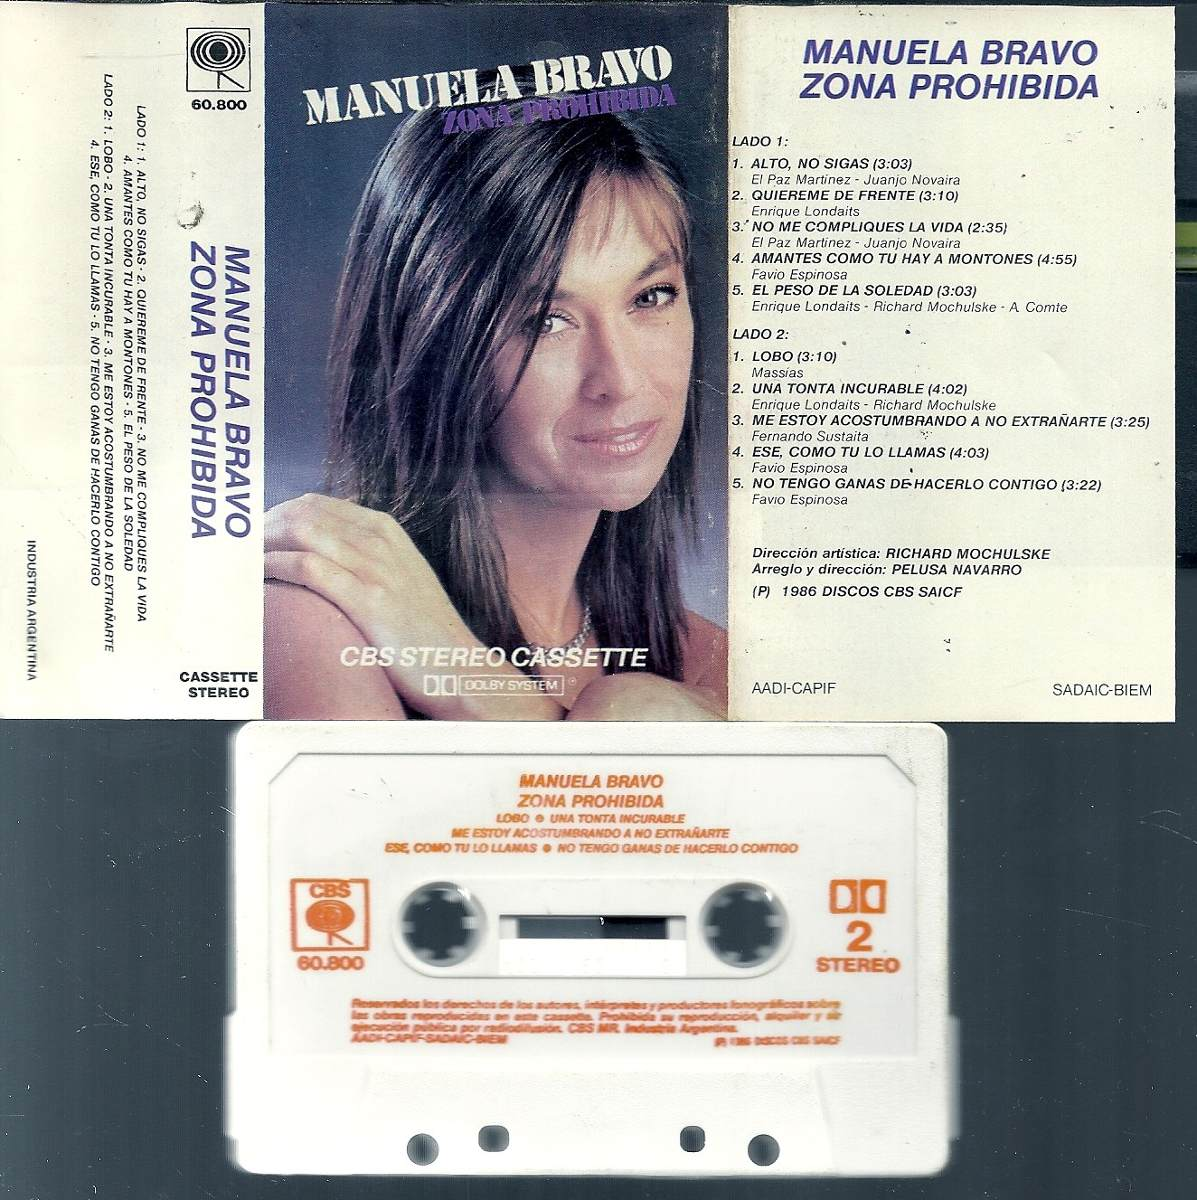 e86098b954f25 Manuela Bravo Zona Prohibida Cassette Nuevo -   100,00 en Mercado Libre